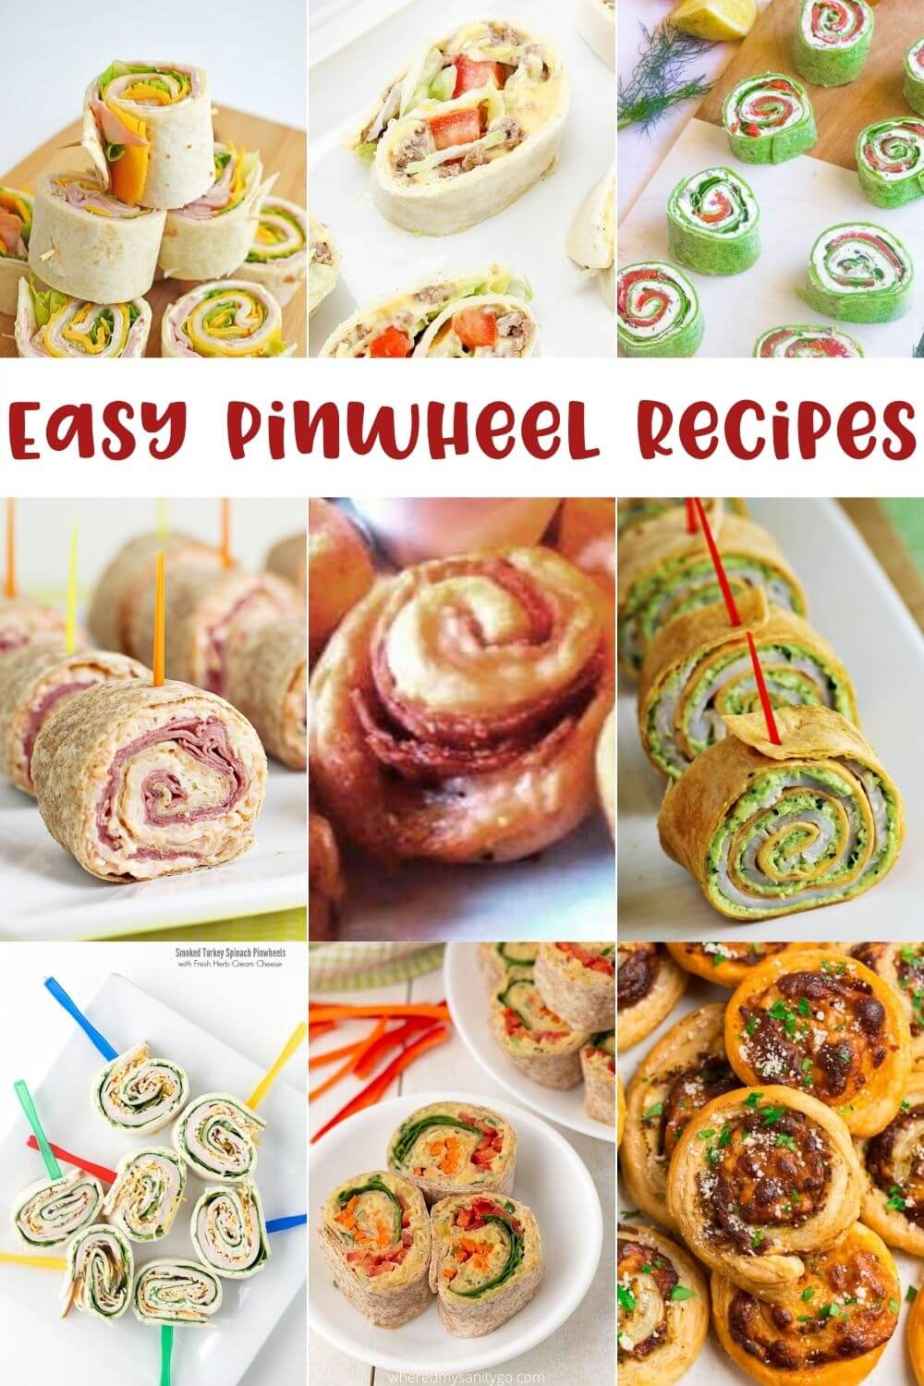 Easy Pinwheels Recipes and Learning How To Make Pinwheels